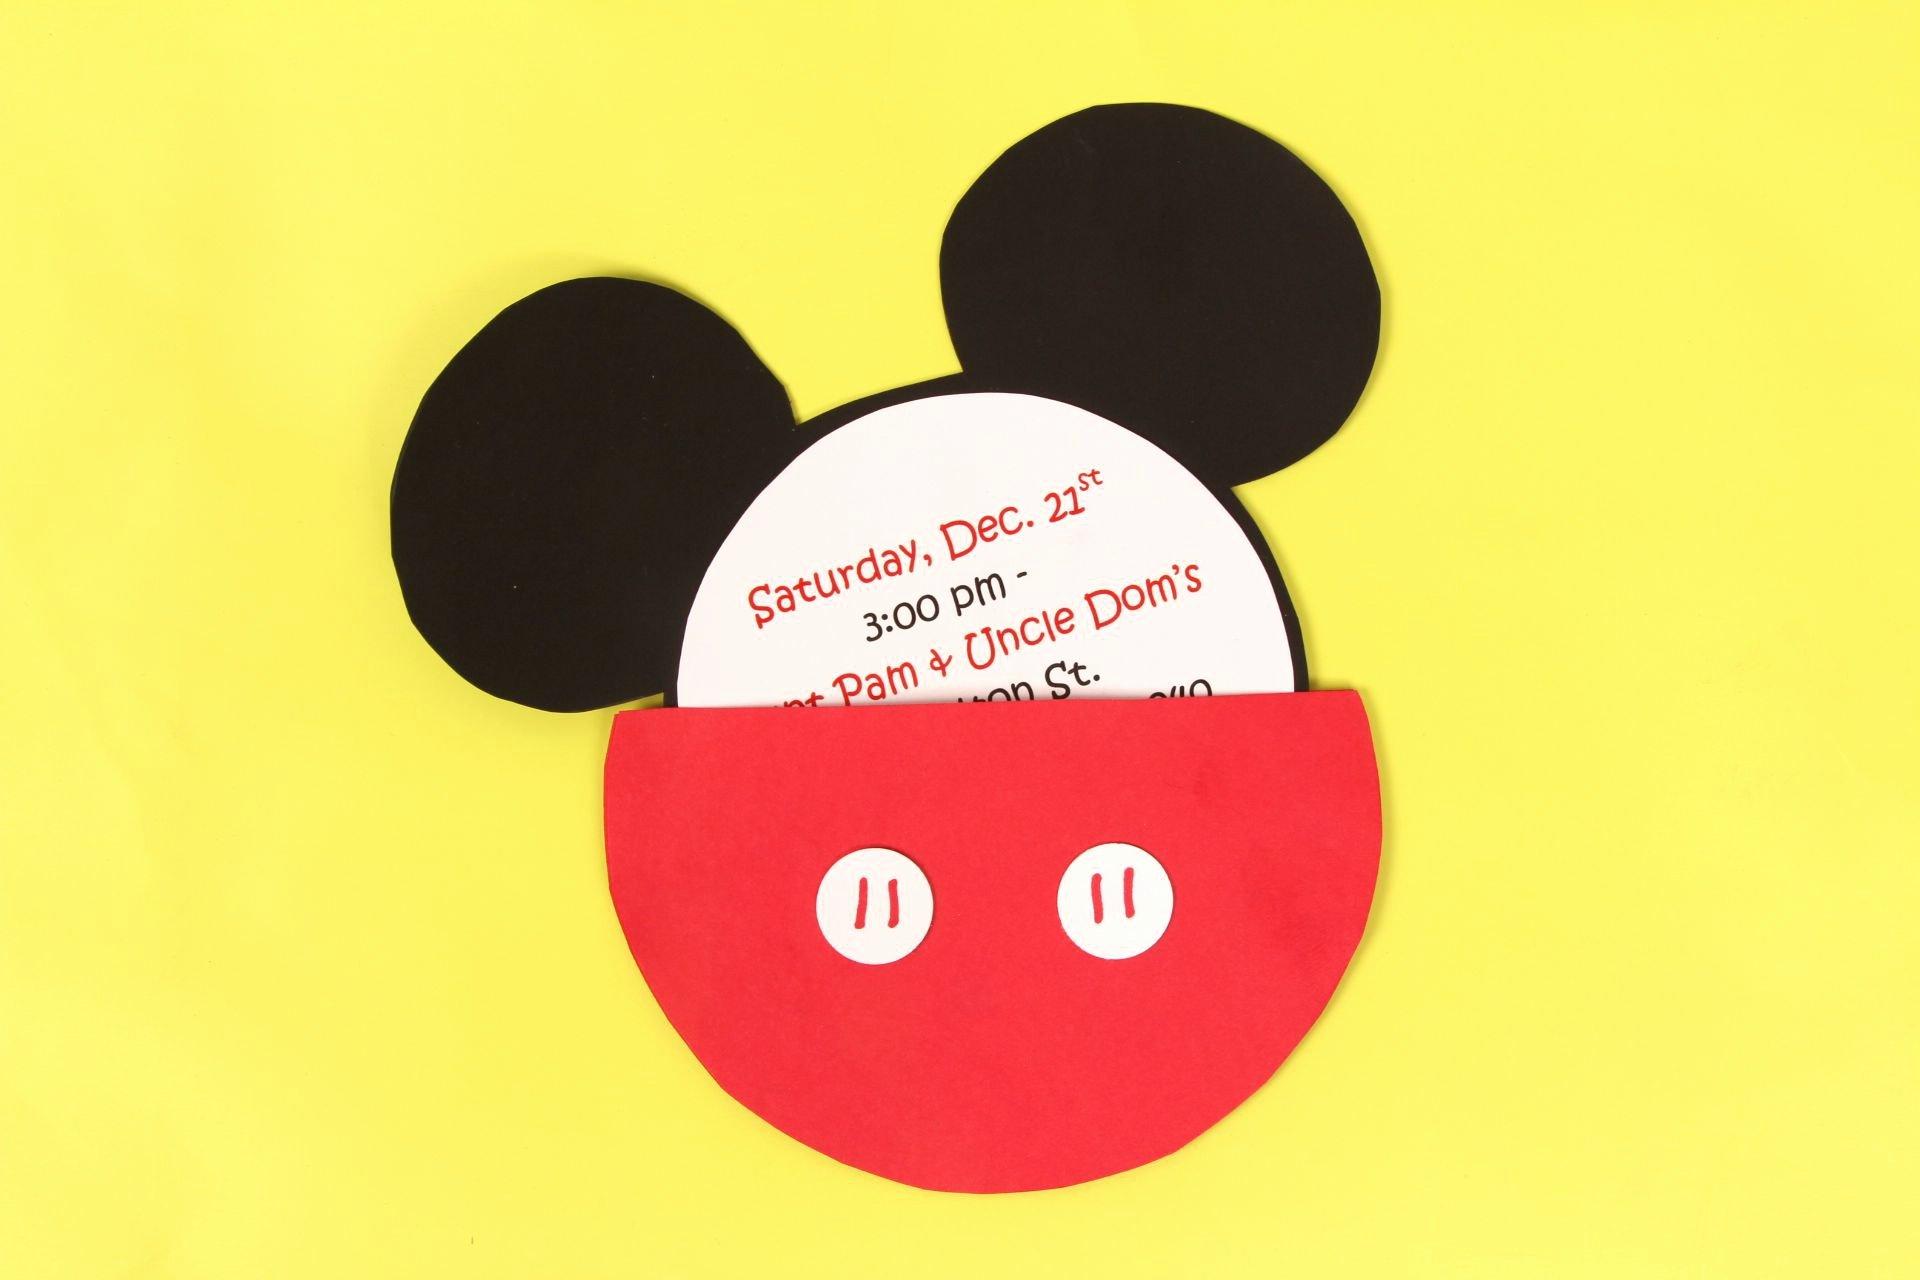 Diy Mickey Mouse Birthday Invitations Beautiful A Diy Mickey Mouse Party Invitation Idea for A Mickey